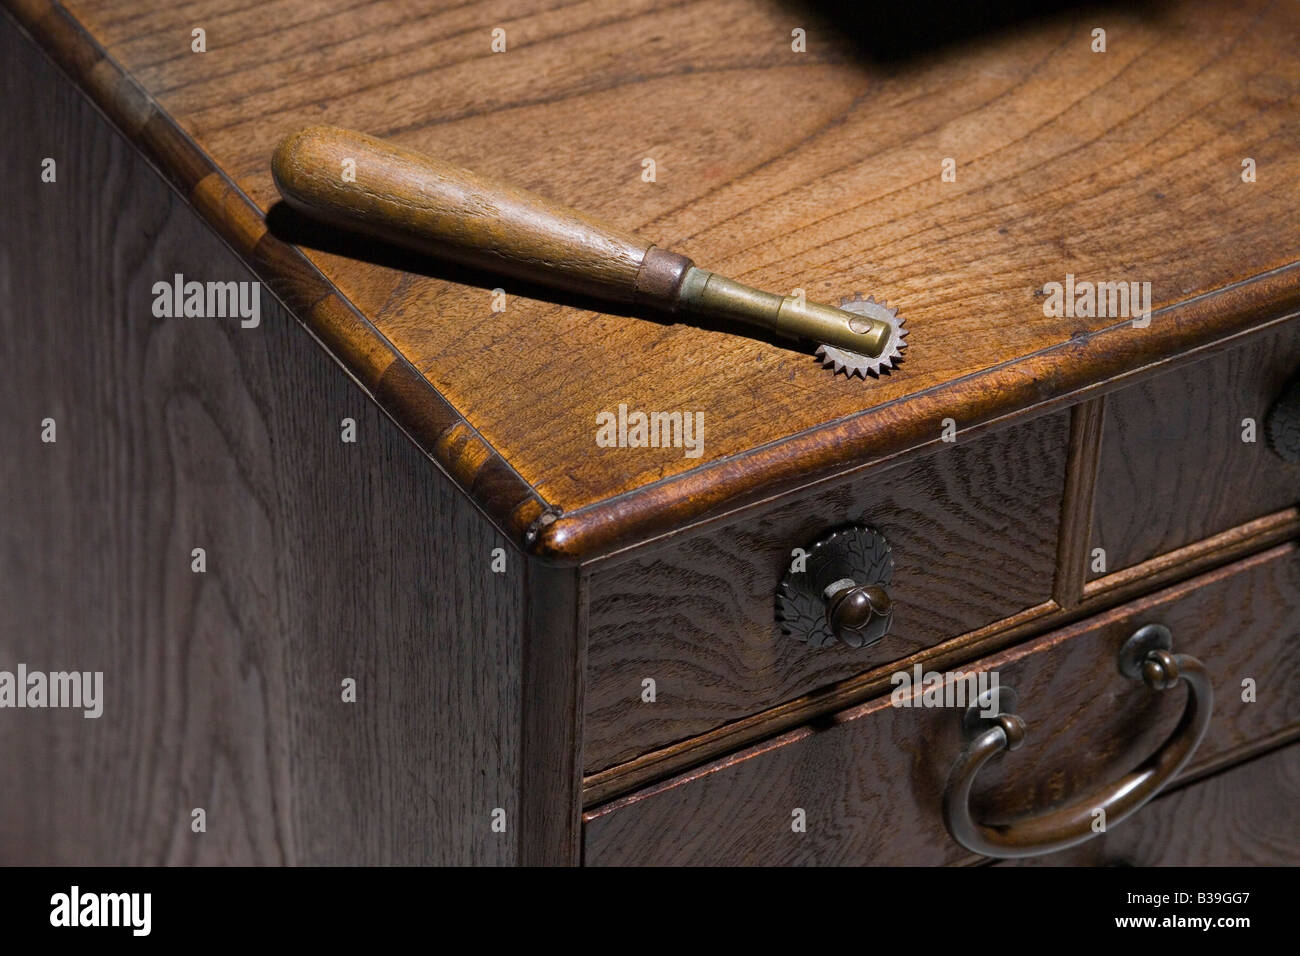 Antique tracing wheel - Stock Image